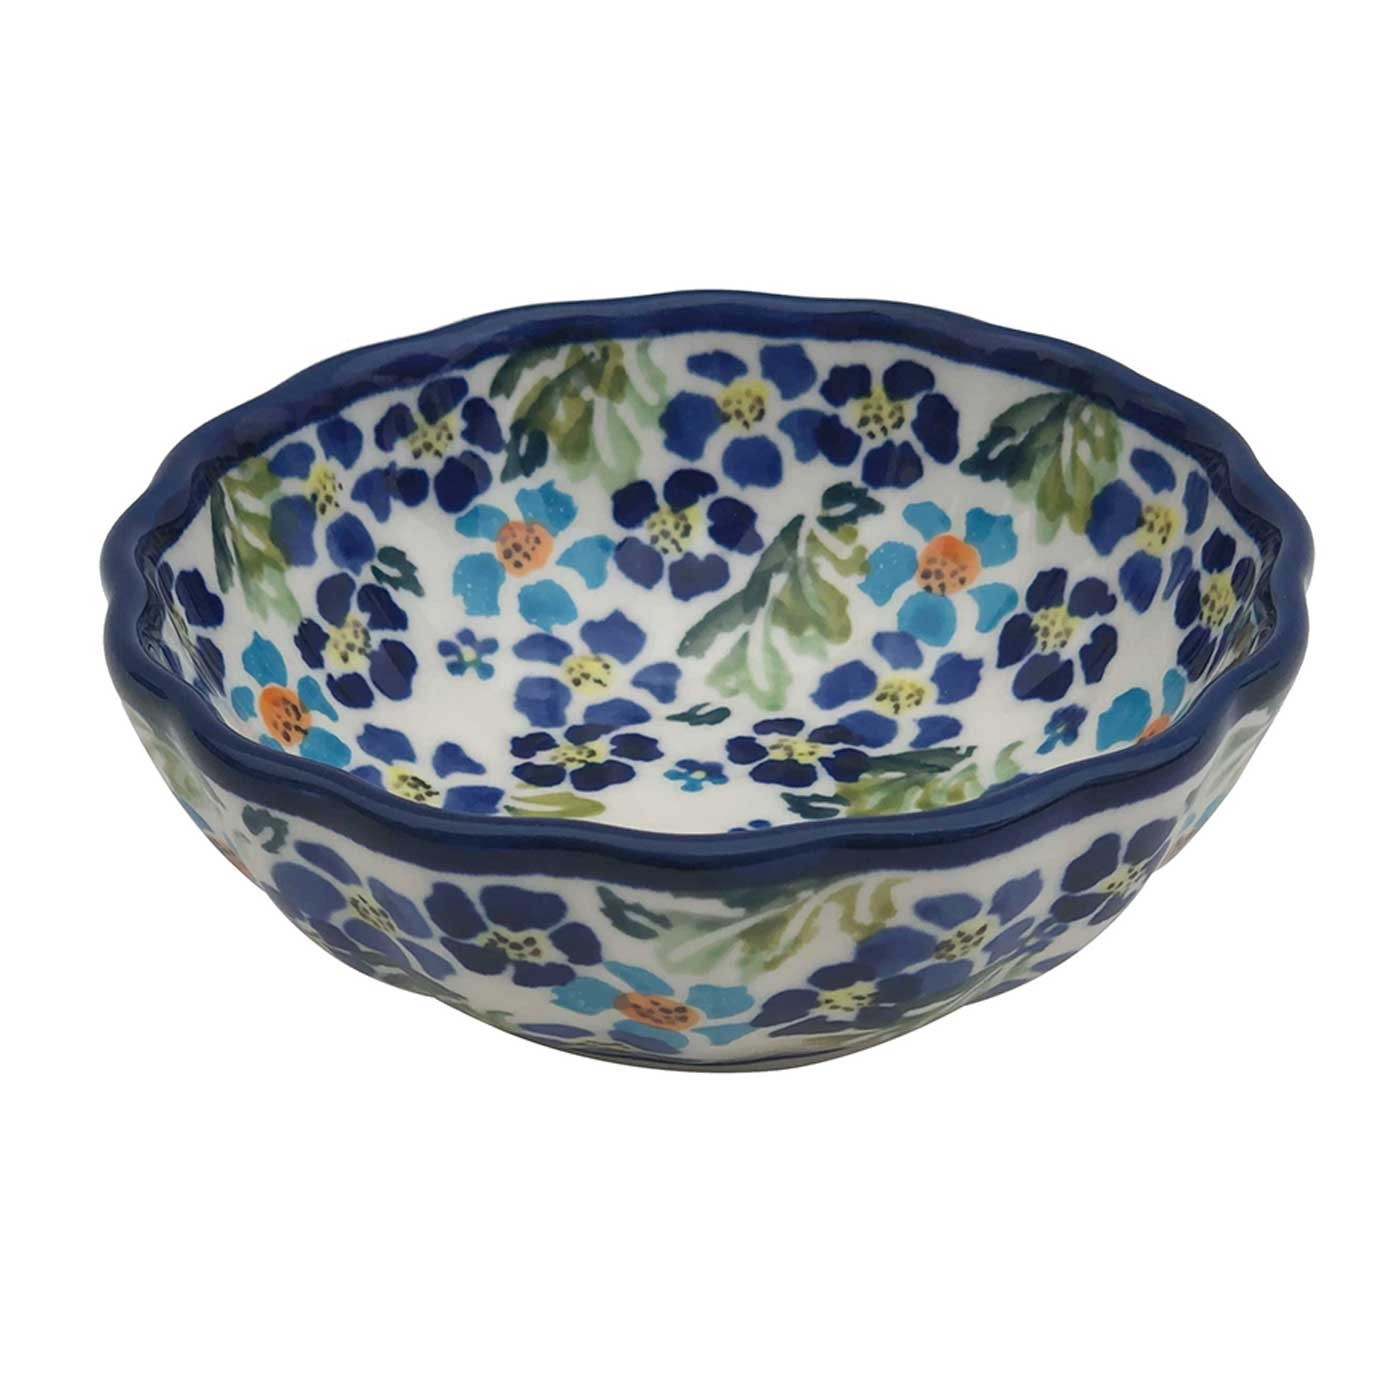 Pottery Avenue Small Scalloped Stoneware Bowl - 1518-DU207 True Blues